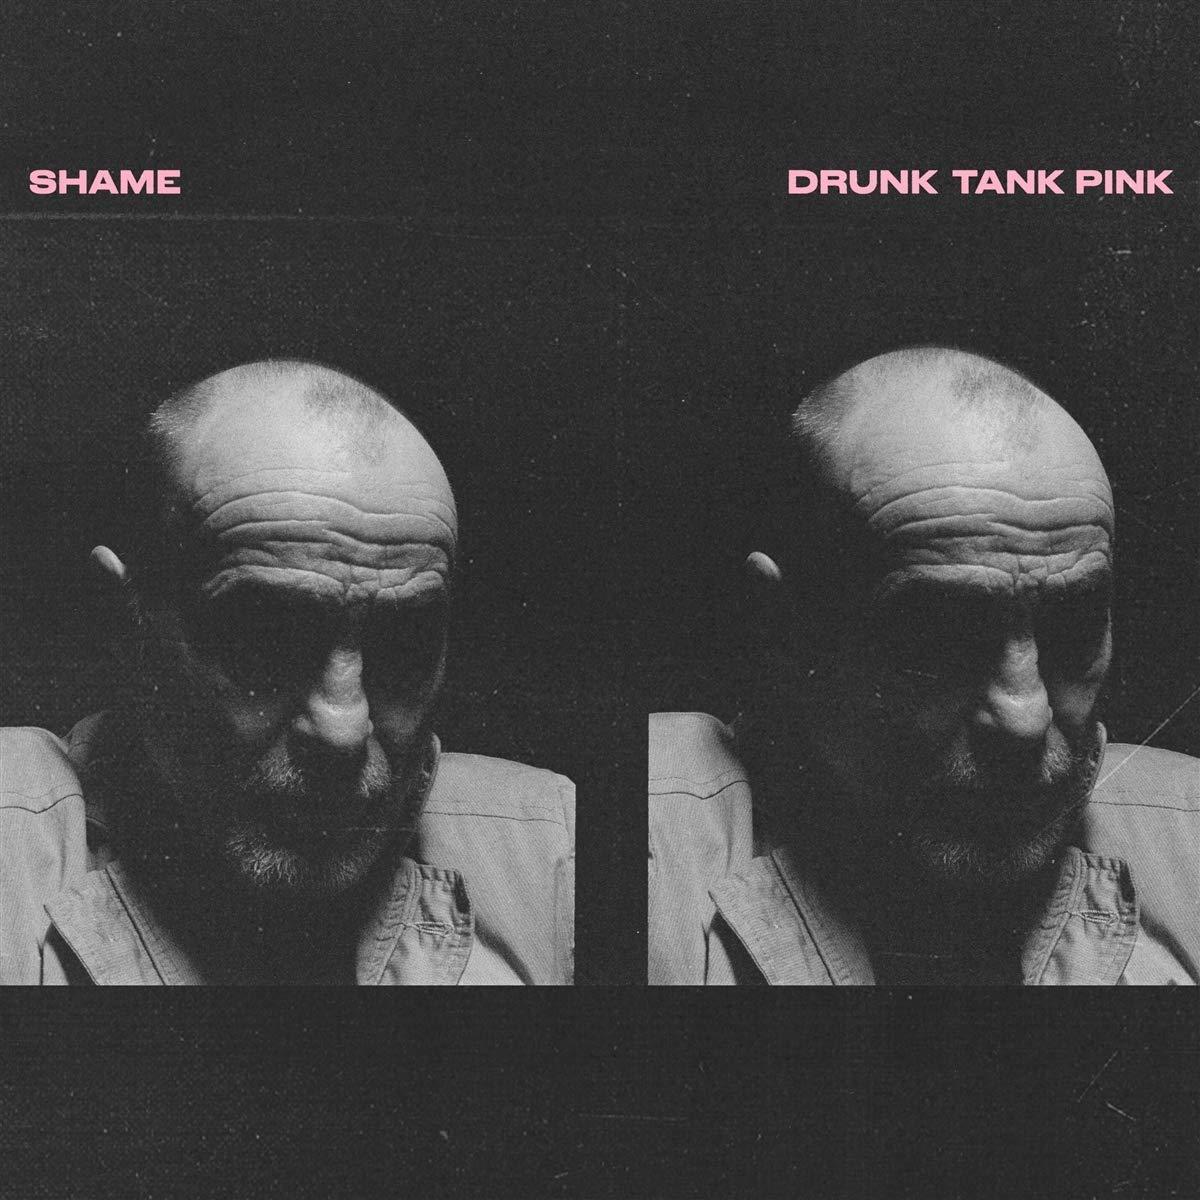 Shame: Drunk Tank Pink [Album Review]